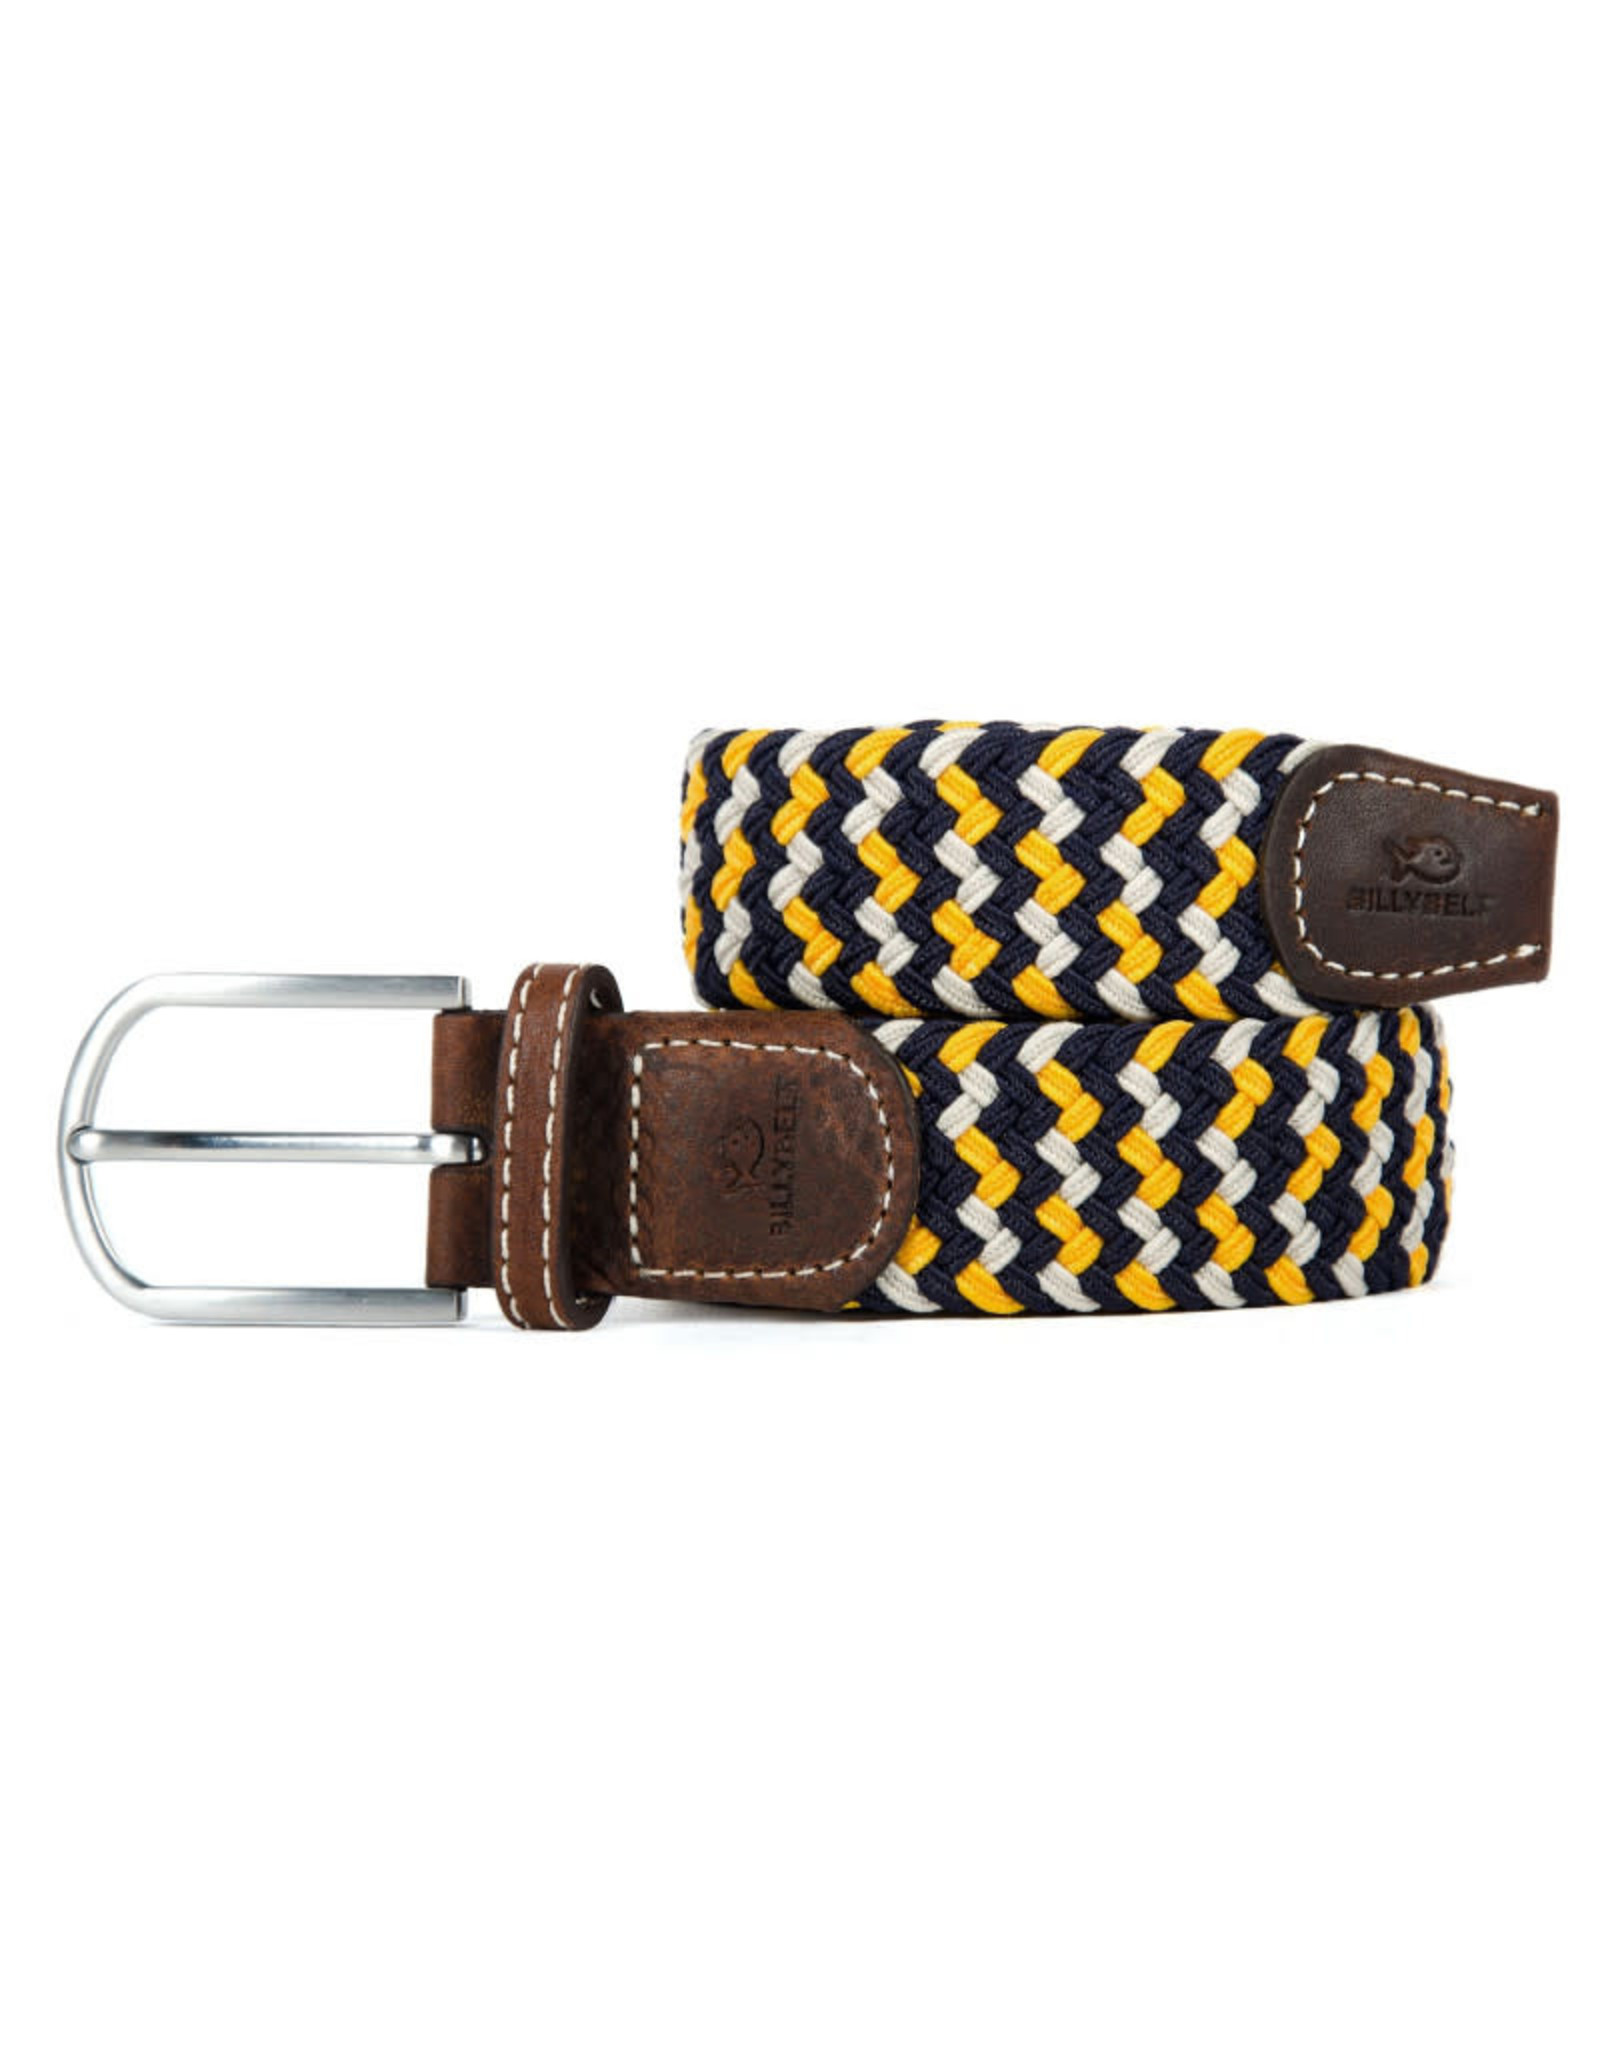 Riem zigzag donkerblauw/geel/ecru T1